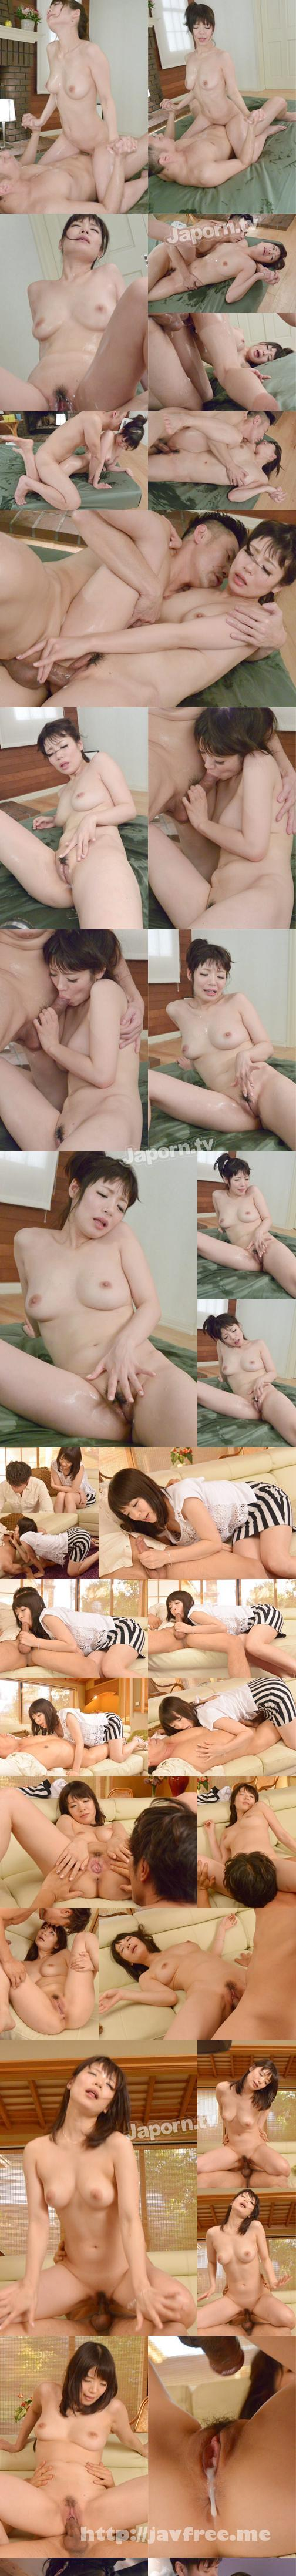 [SMD 112] S Model 112 恥じらいオッパイGカップ巨乳猥褻娘コンプリートファイル 3HRS : 水城奈緒 水城奈緒 SMD Nao Mizuki